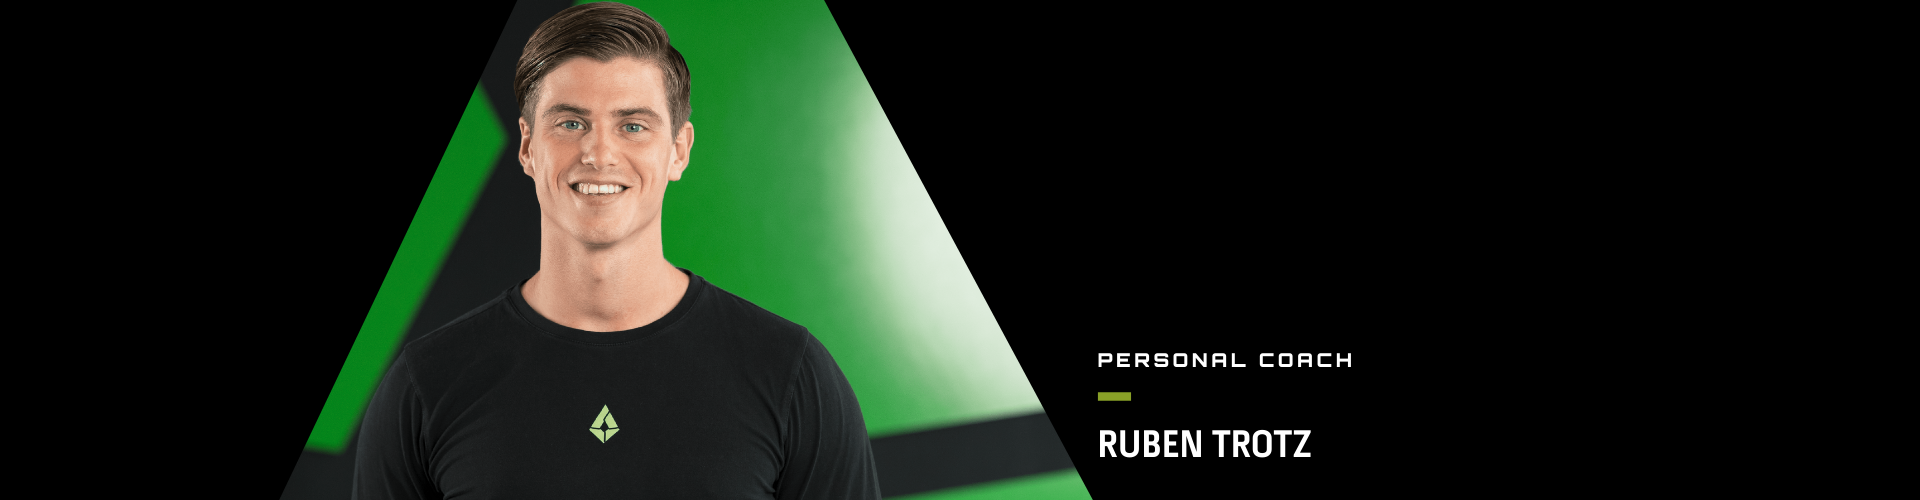 LIVEPT coach Ruben Trotz